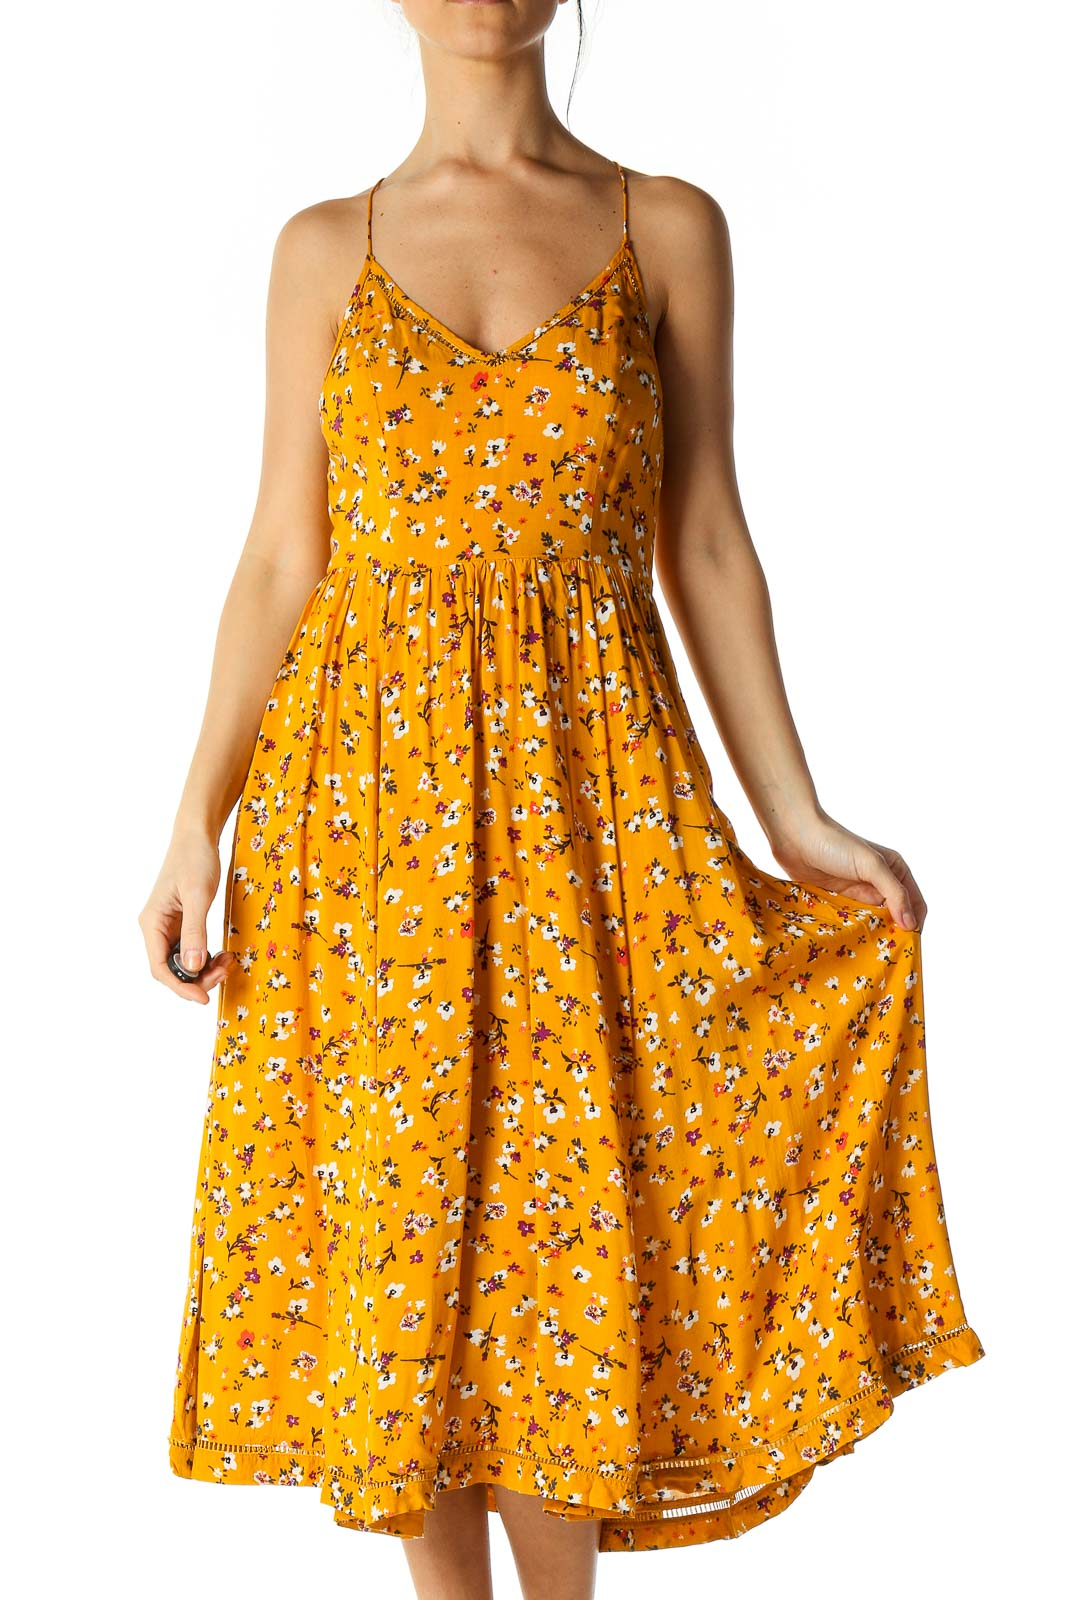 Orange Retro A-Line Dress Front